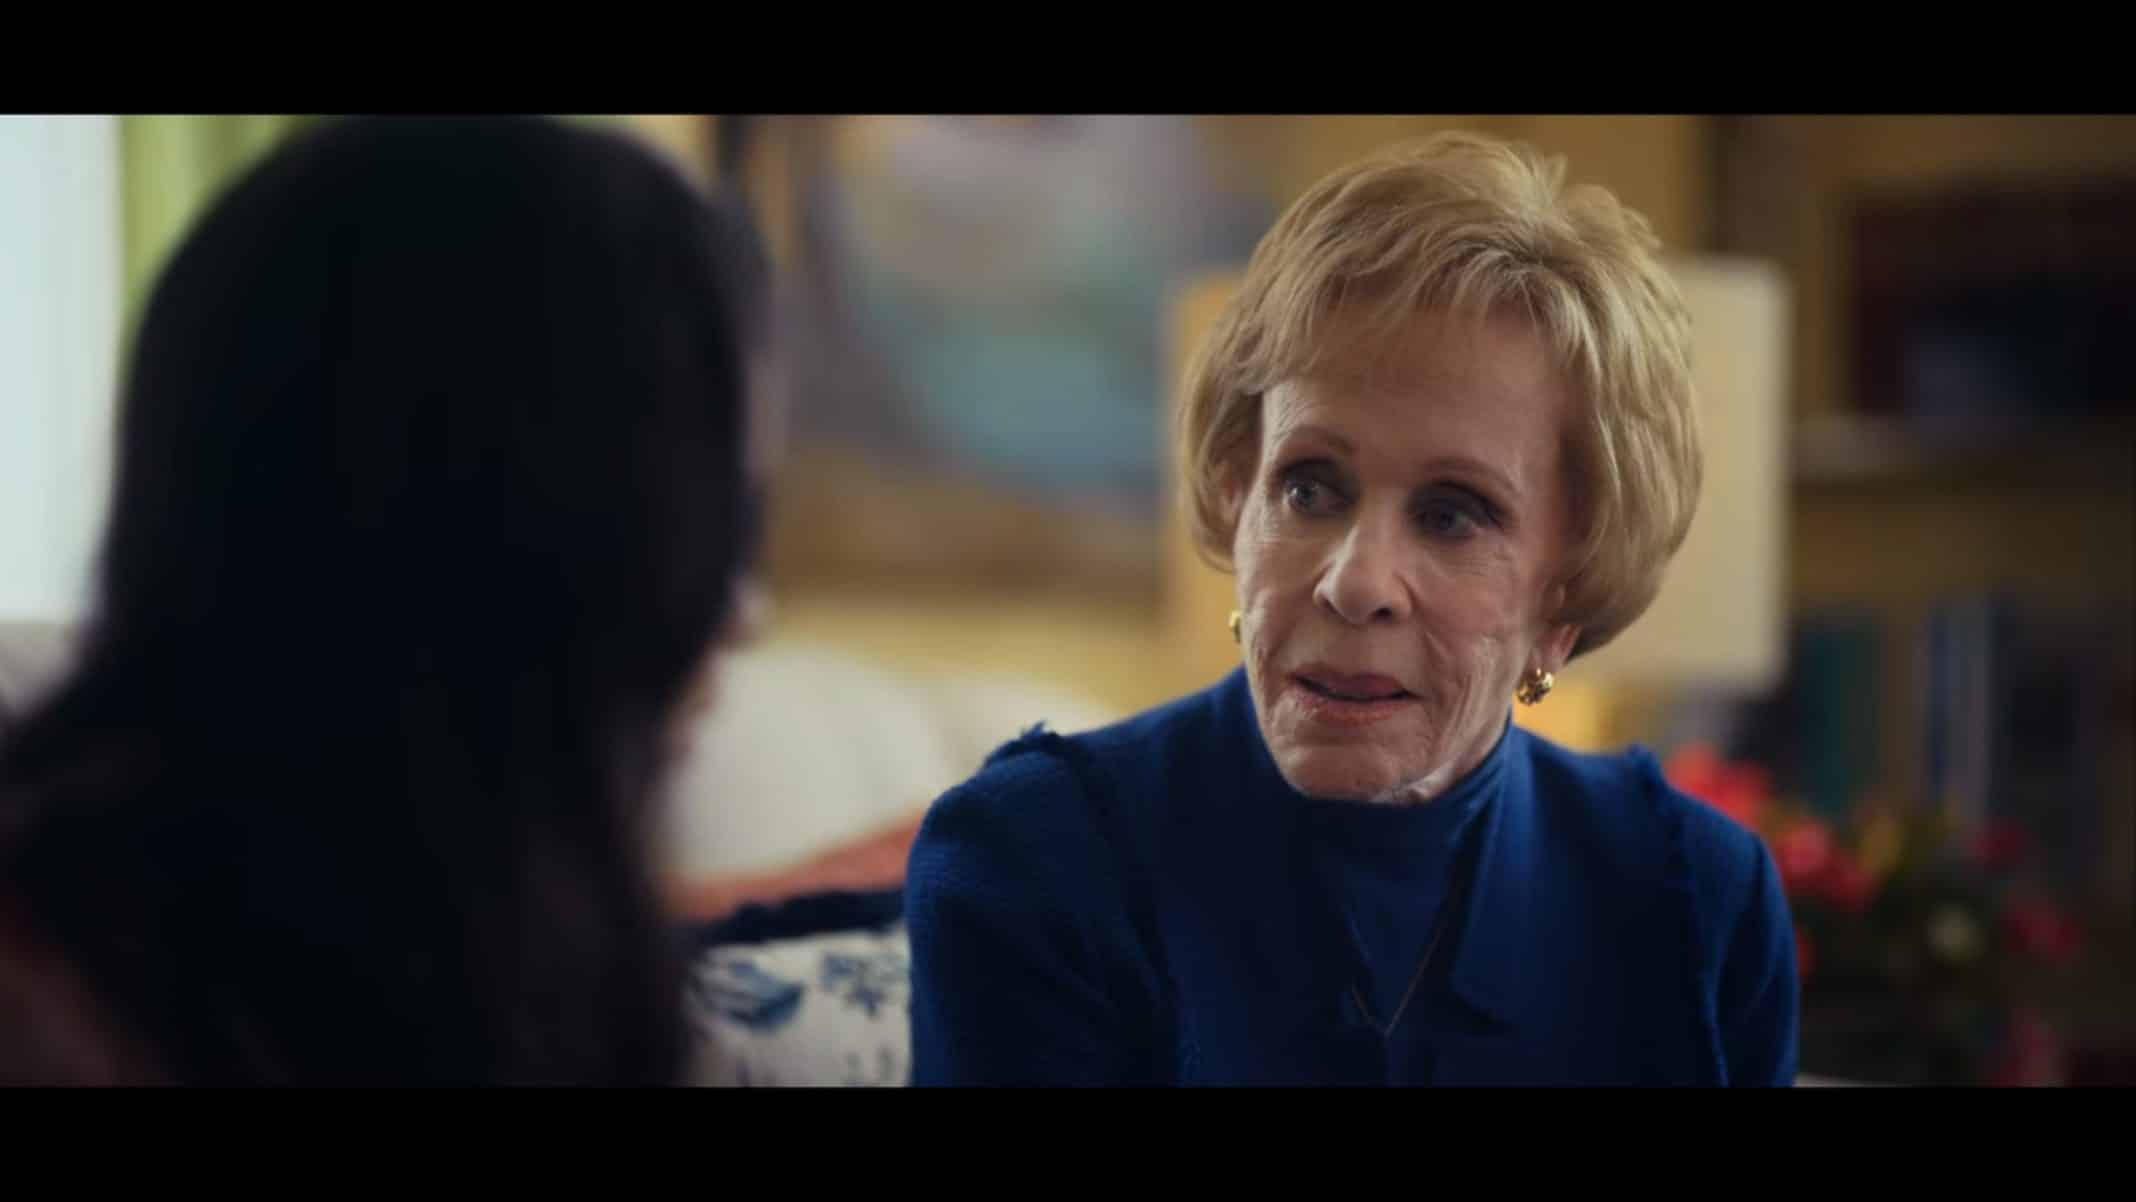 Joan (Carol Burnett) having a heart to heart with Amber.